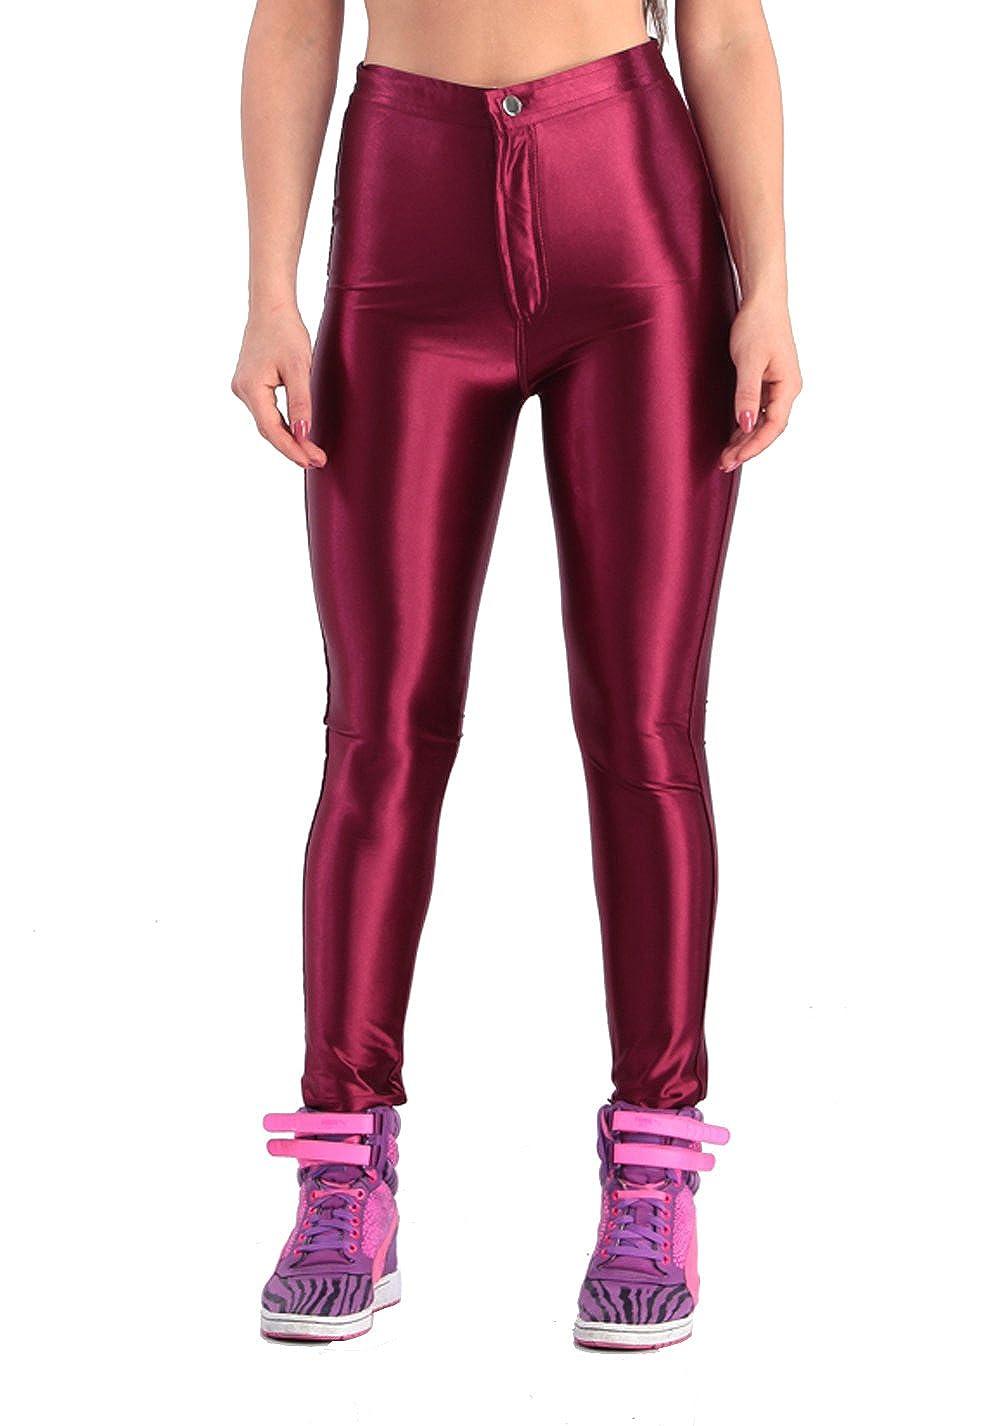 Wine Red Yomsong Women's High Waist Shiny Satin Neon Disco Pants